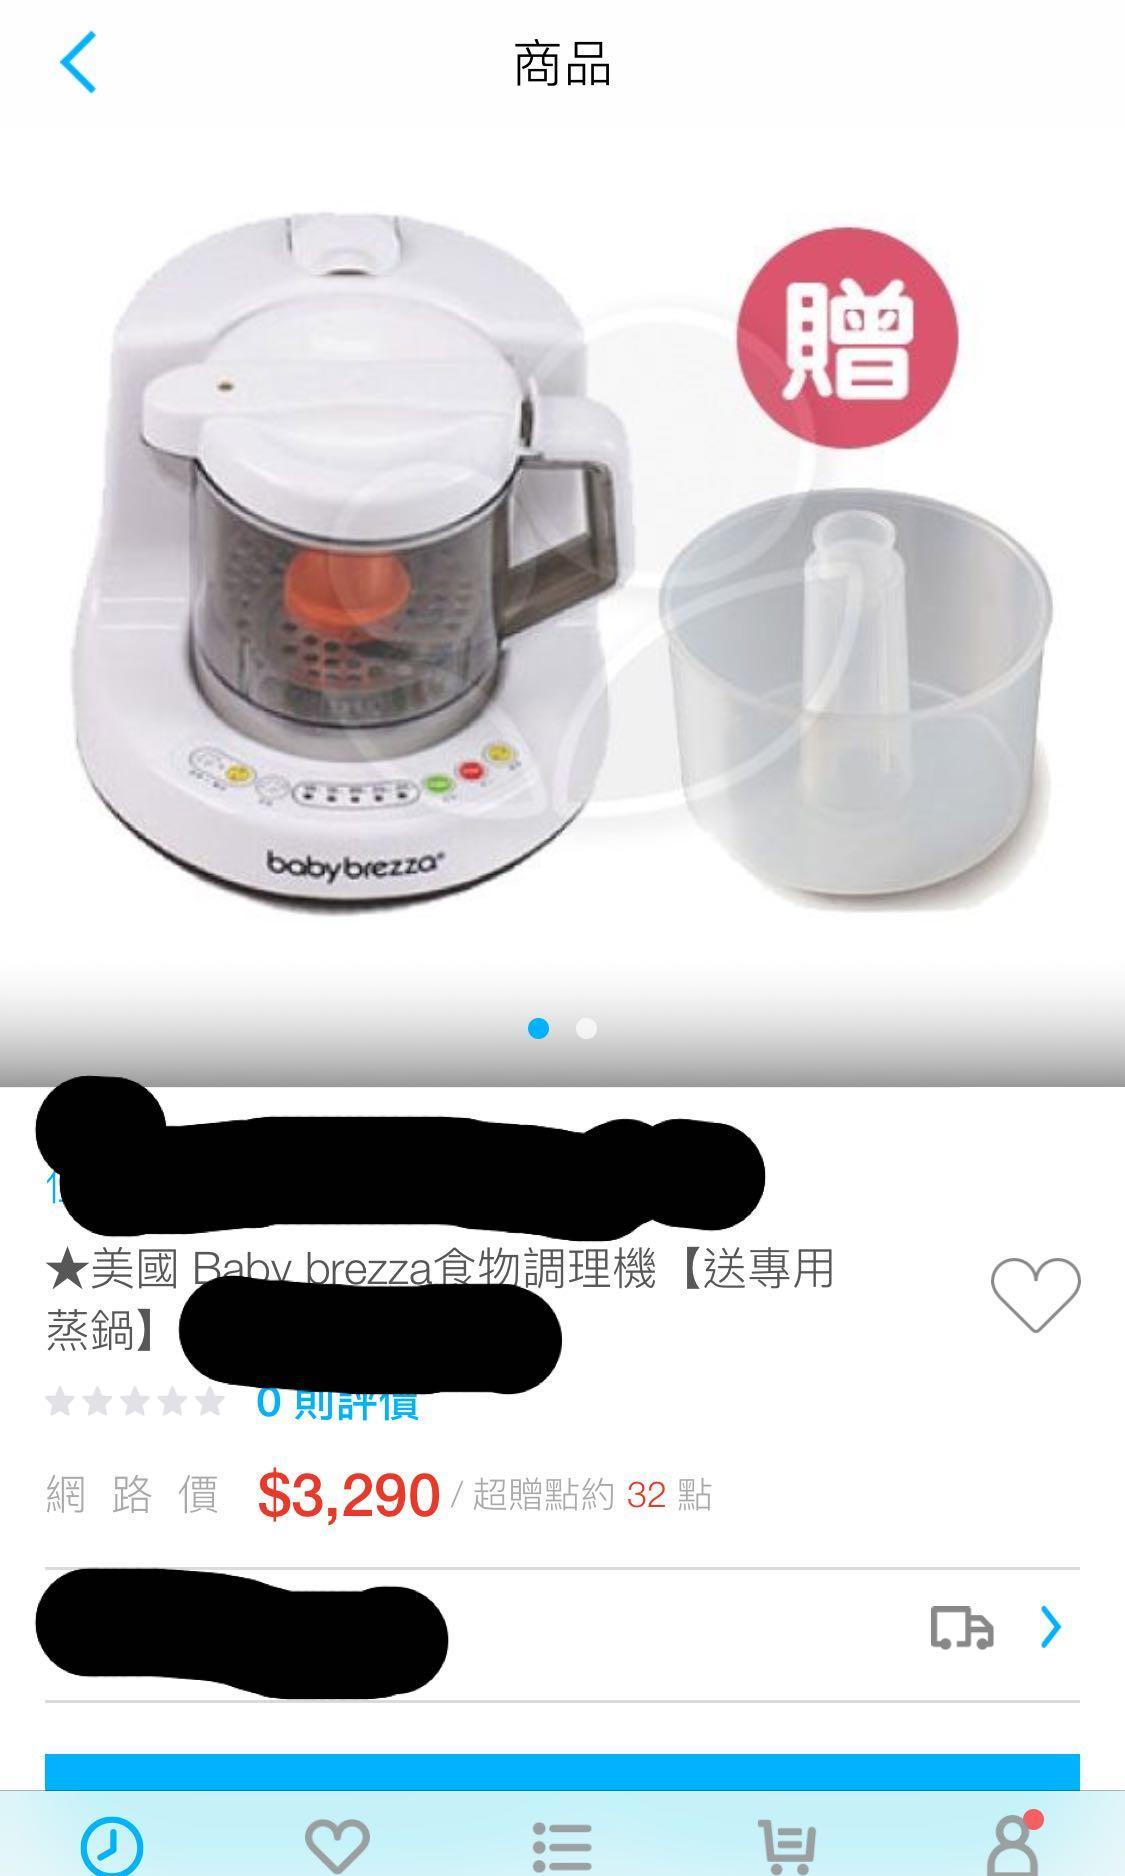 Baby brezza 食物調理機